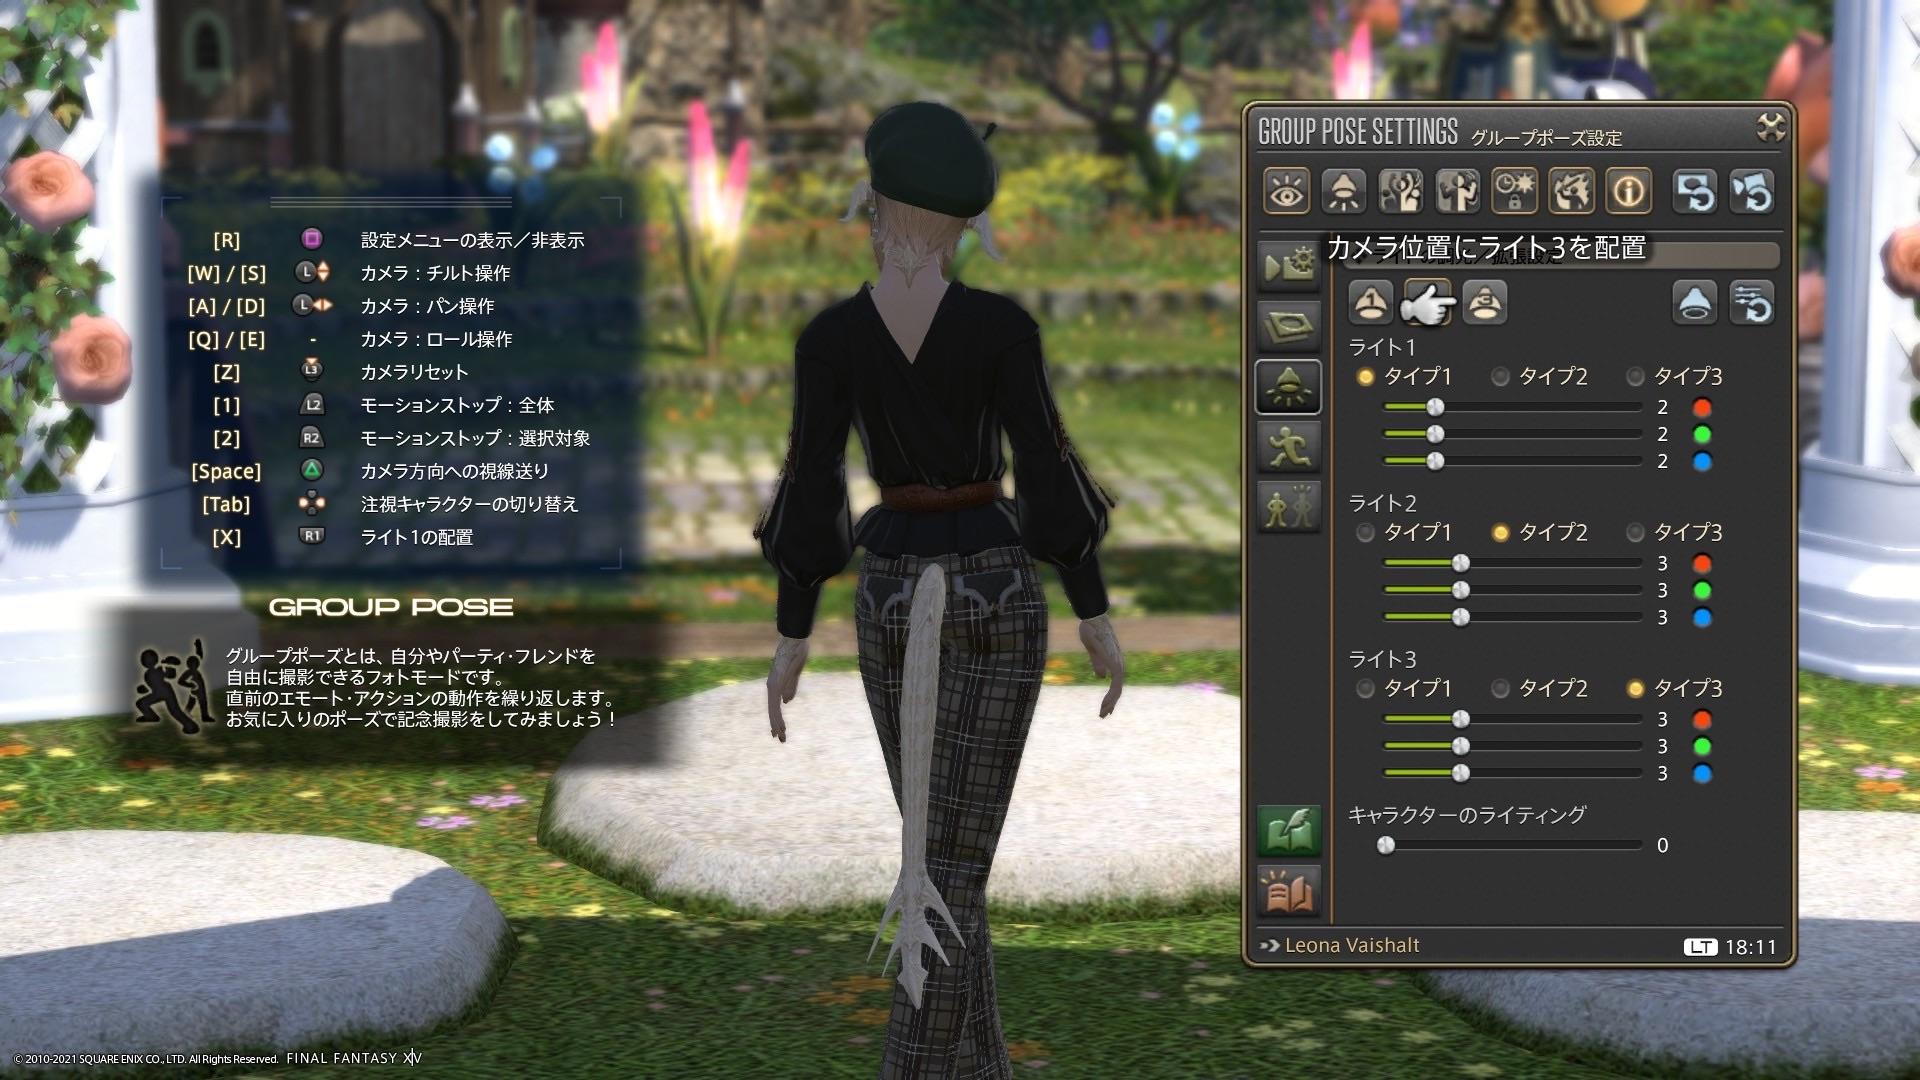 f:id:leonanoblog:20210912181424j:plain